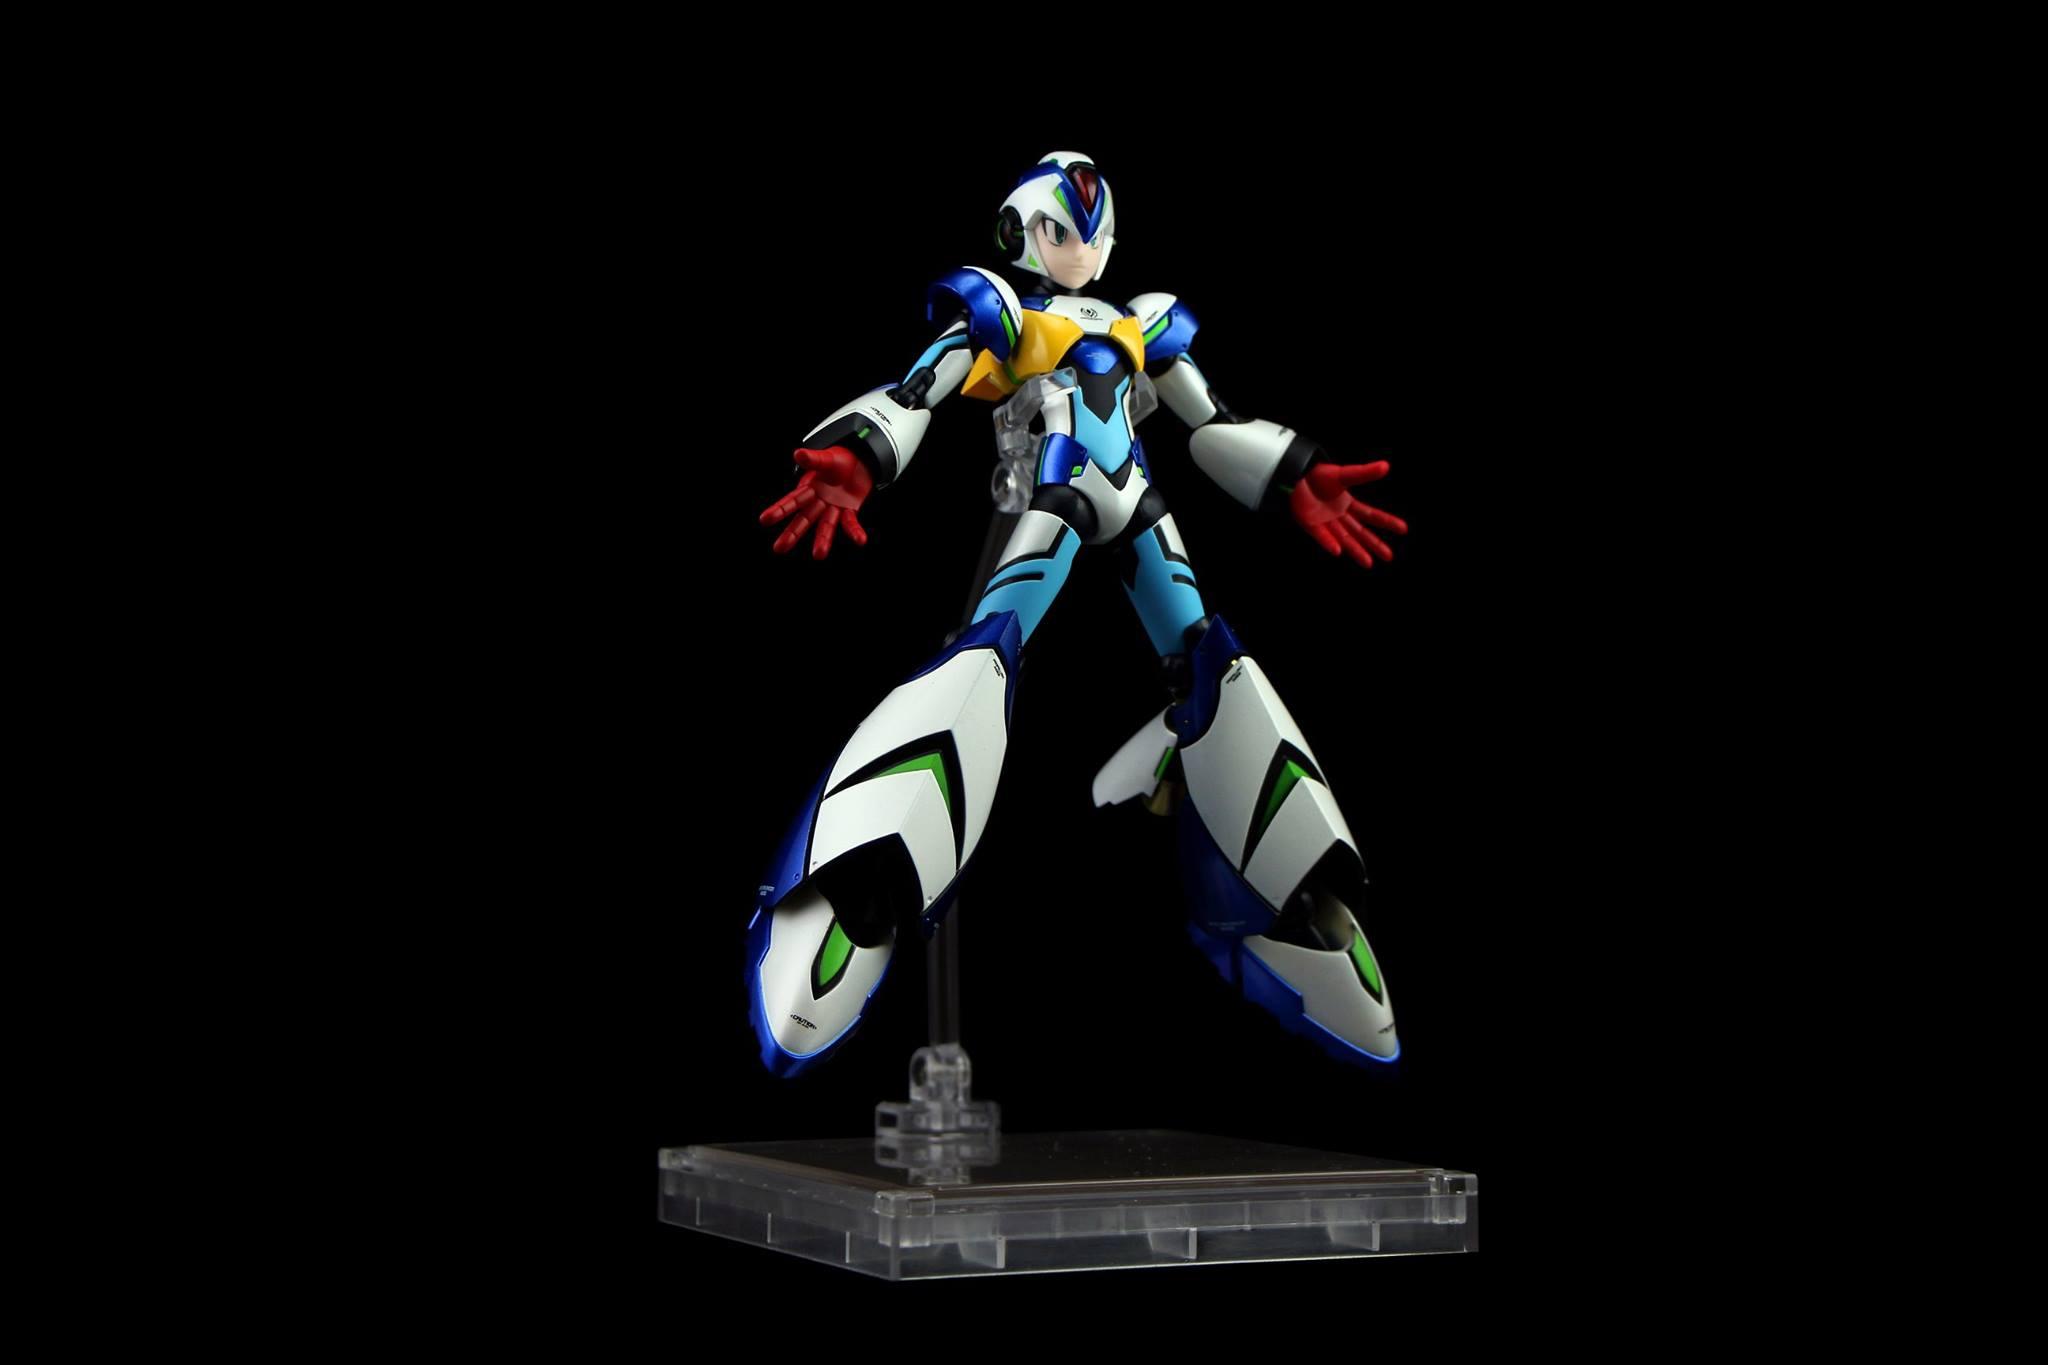 TruForce Collectibles Designer Series Megaman X Action Figure